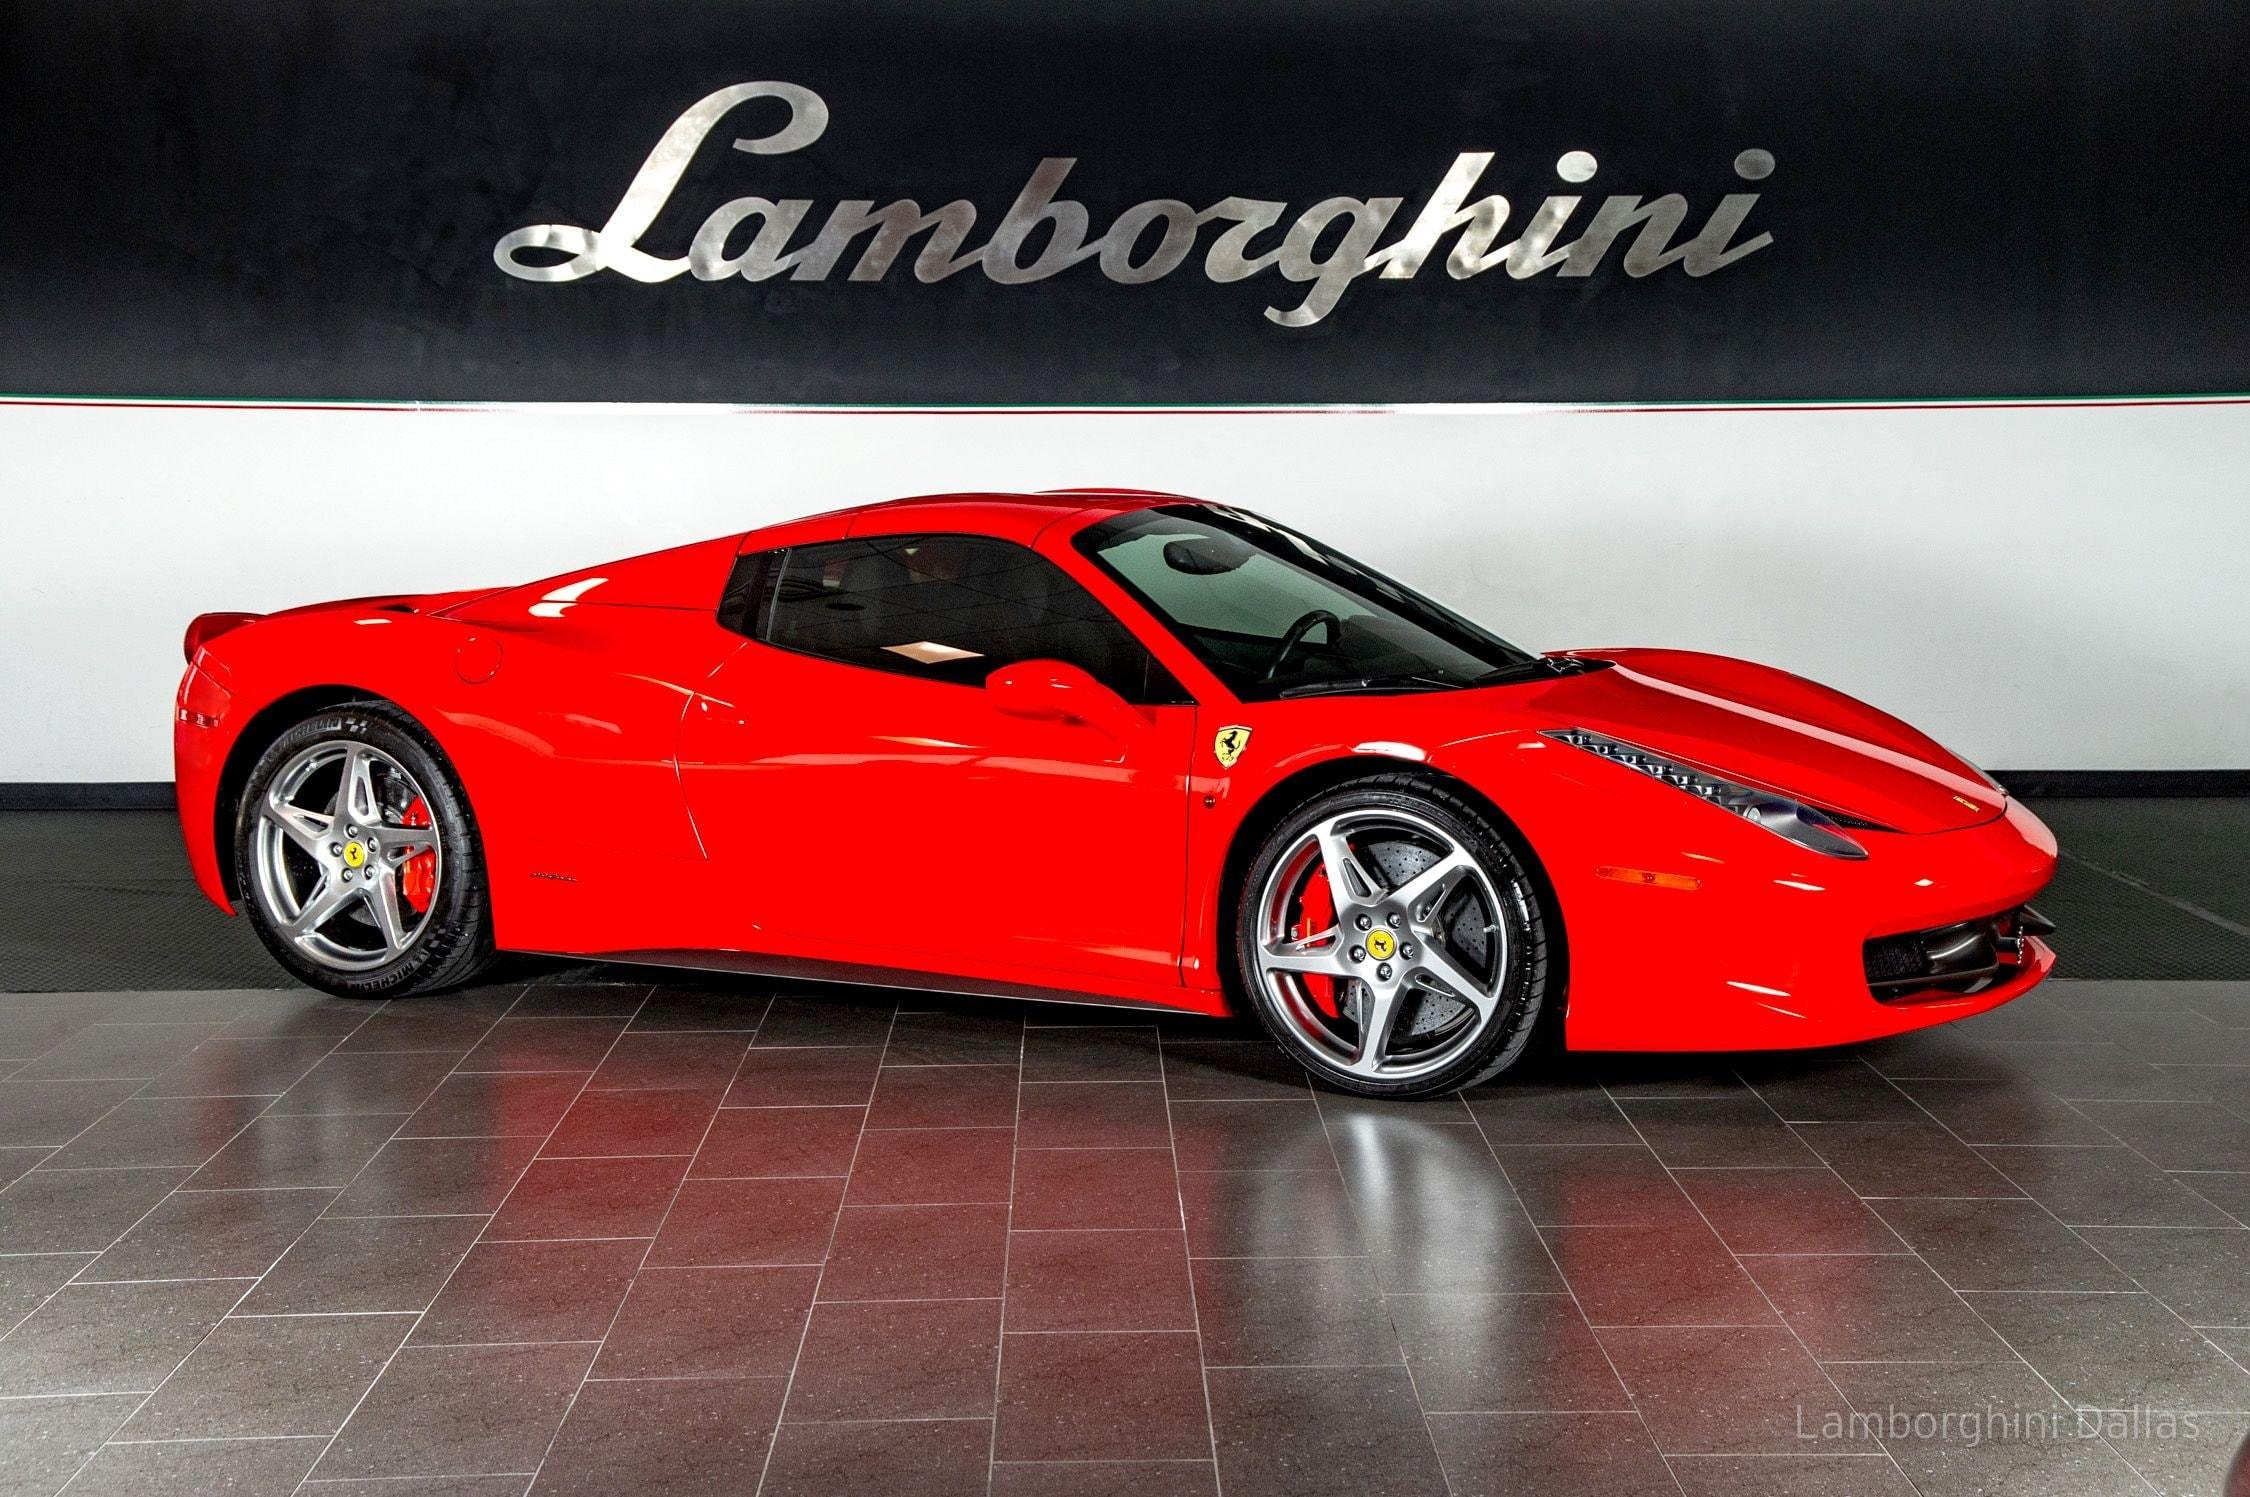 Used 2013 Ferrari 458 Italia For Sale Richardson Tx Stock 20l0319b Vin Zff68nha2d0191103